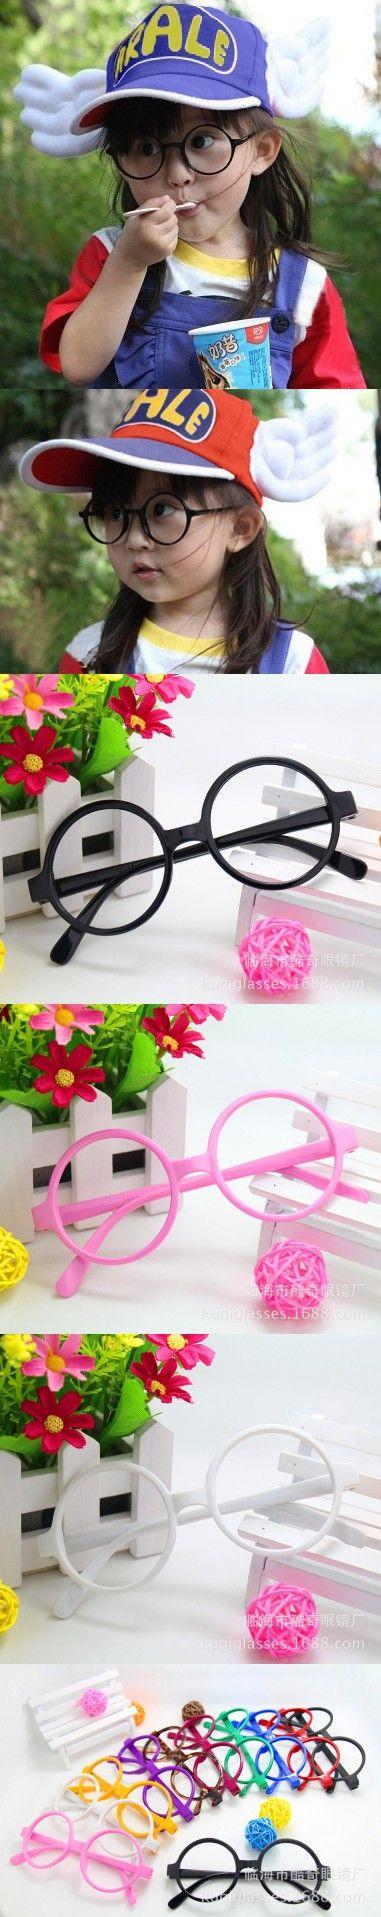 Baby Kids Sunglasses Infants Eyeglasses Spetacles Goggles Boy Girls Eyewear Children Sunglass Oculos De Sol criancaes